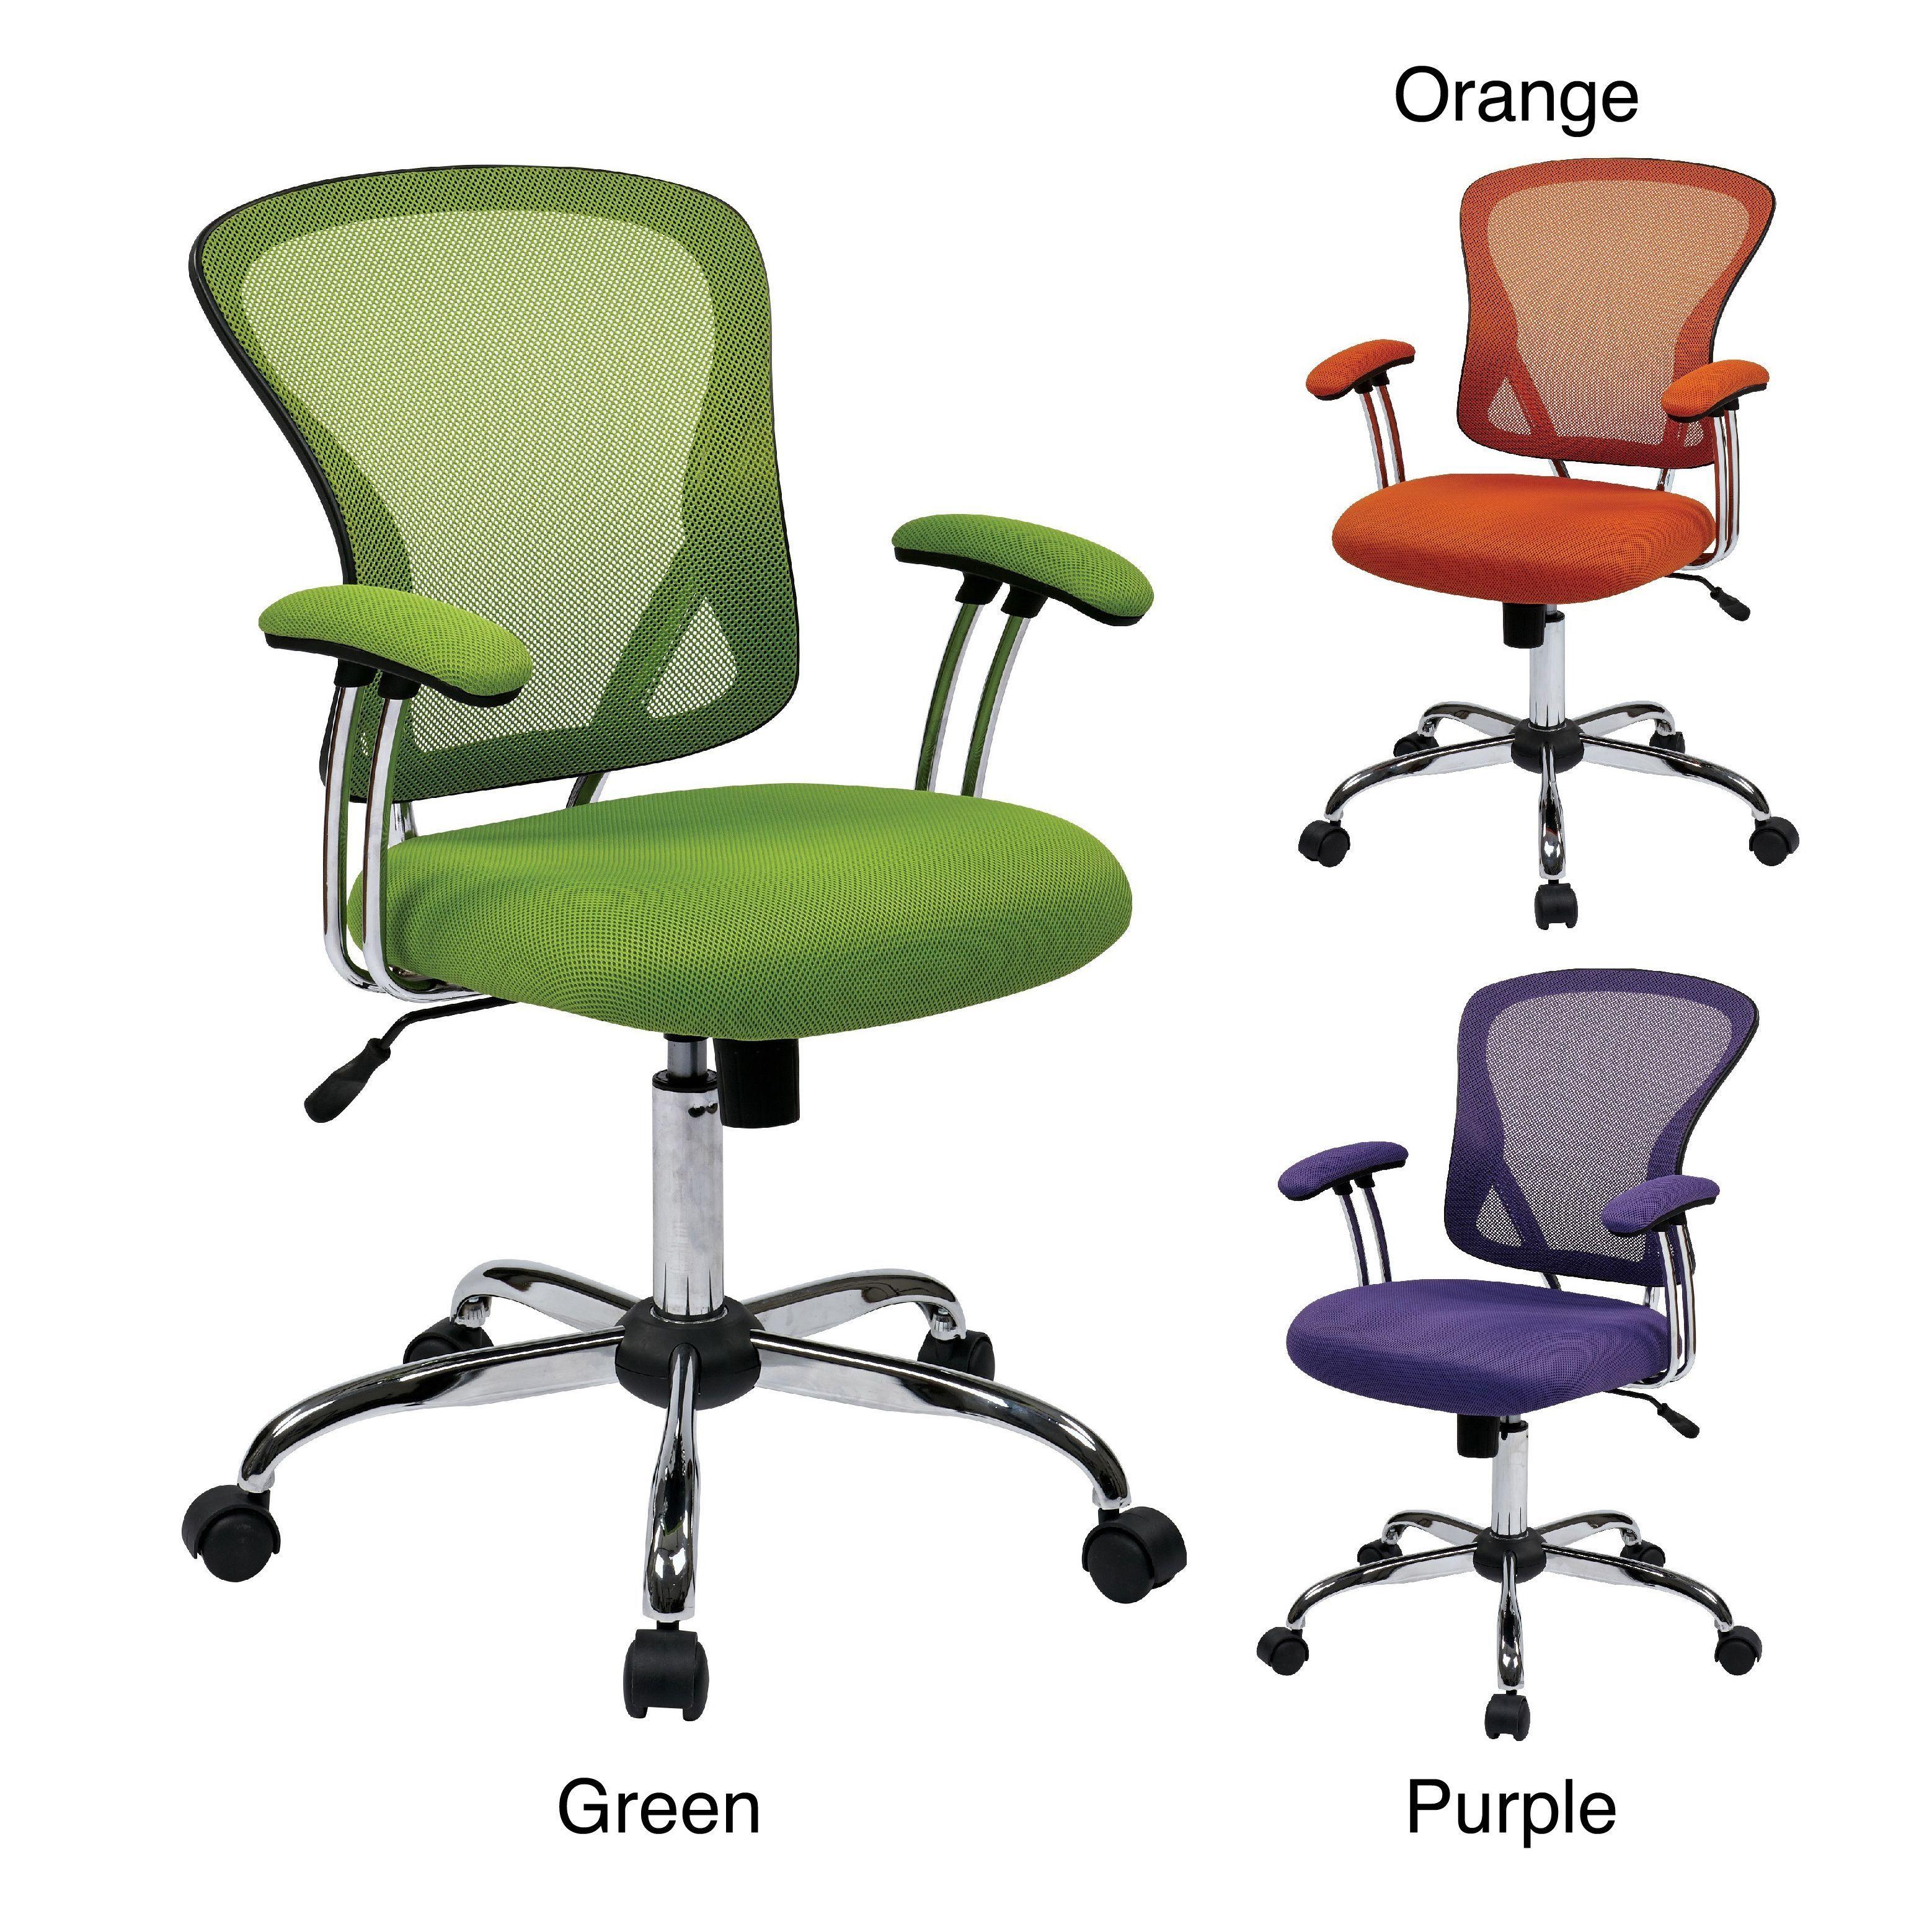 Purple office chair Juliana Task Chair with Adjustable Tilt